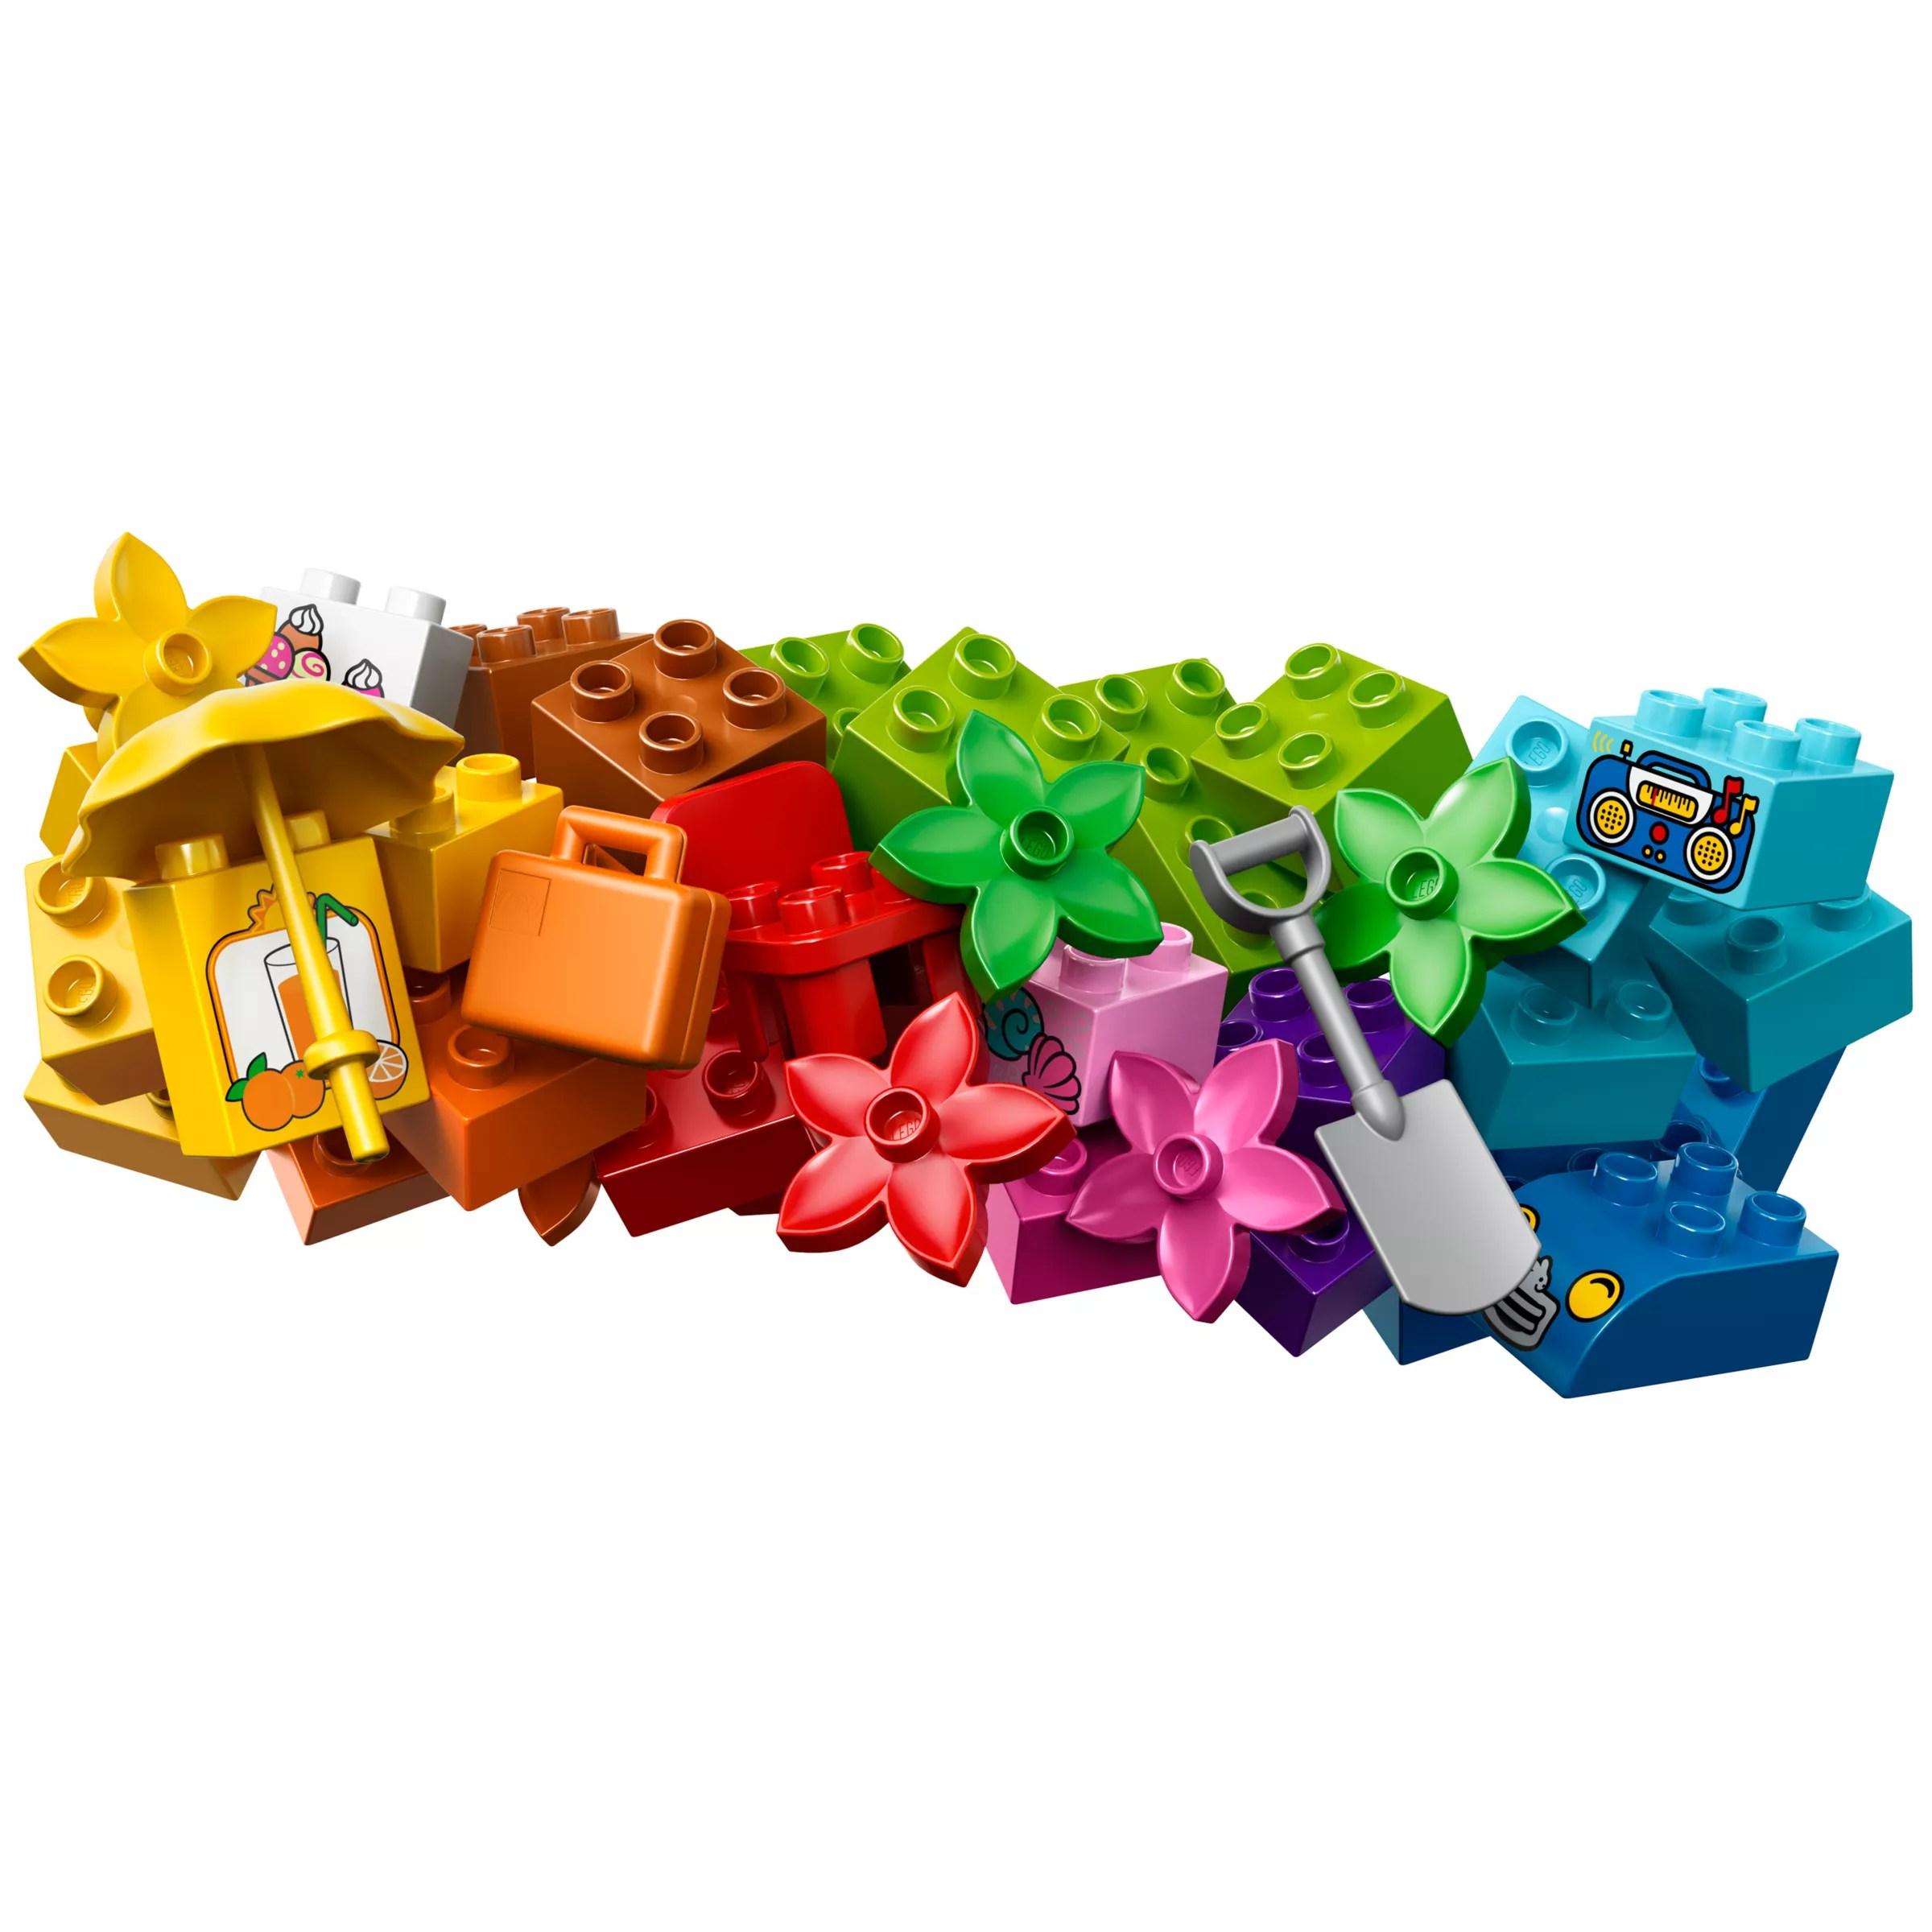 Lego Duplo 10618 Creative Building Box At John Lewis